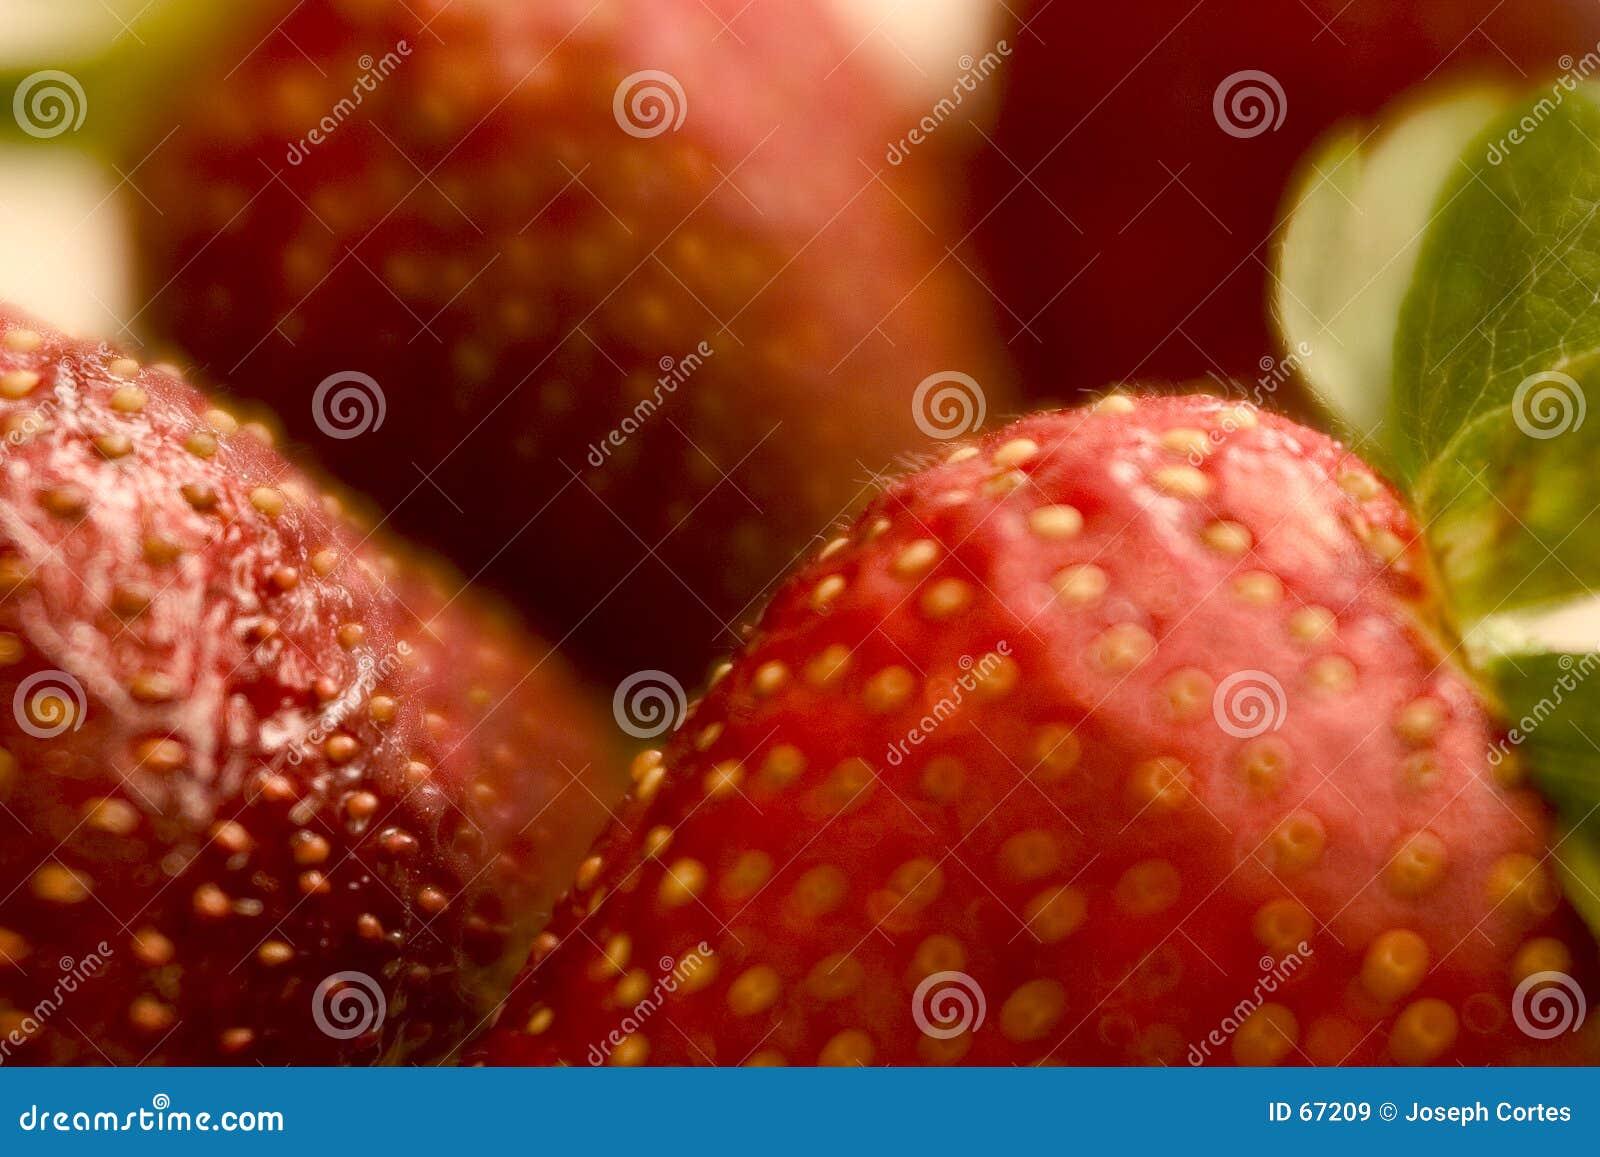 Fields jordgubben